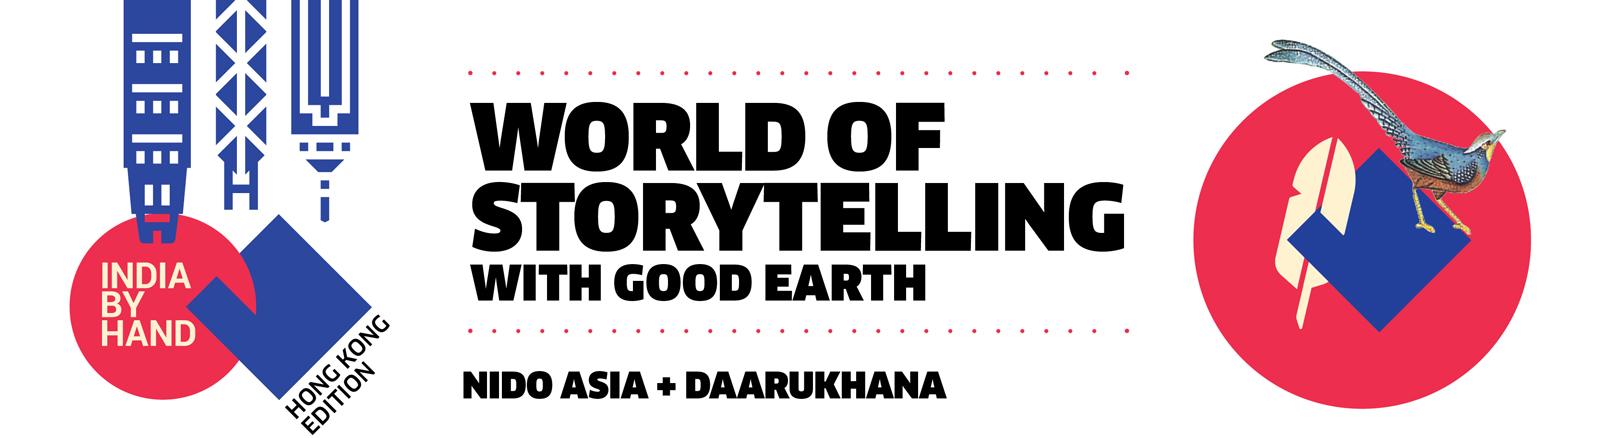 World-of-Storytelling-01.jpg